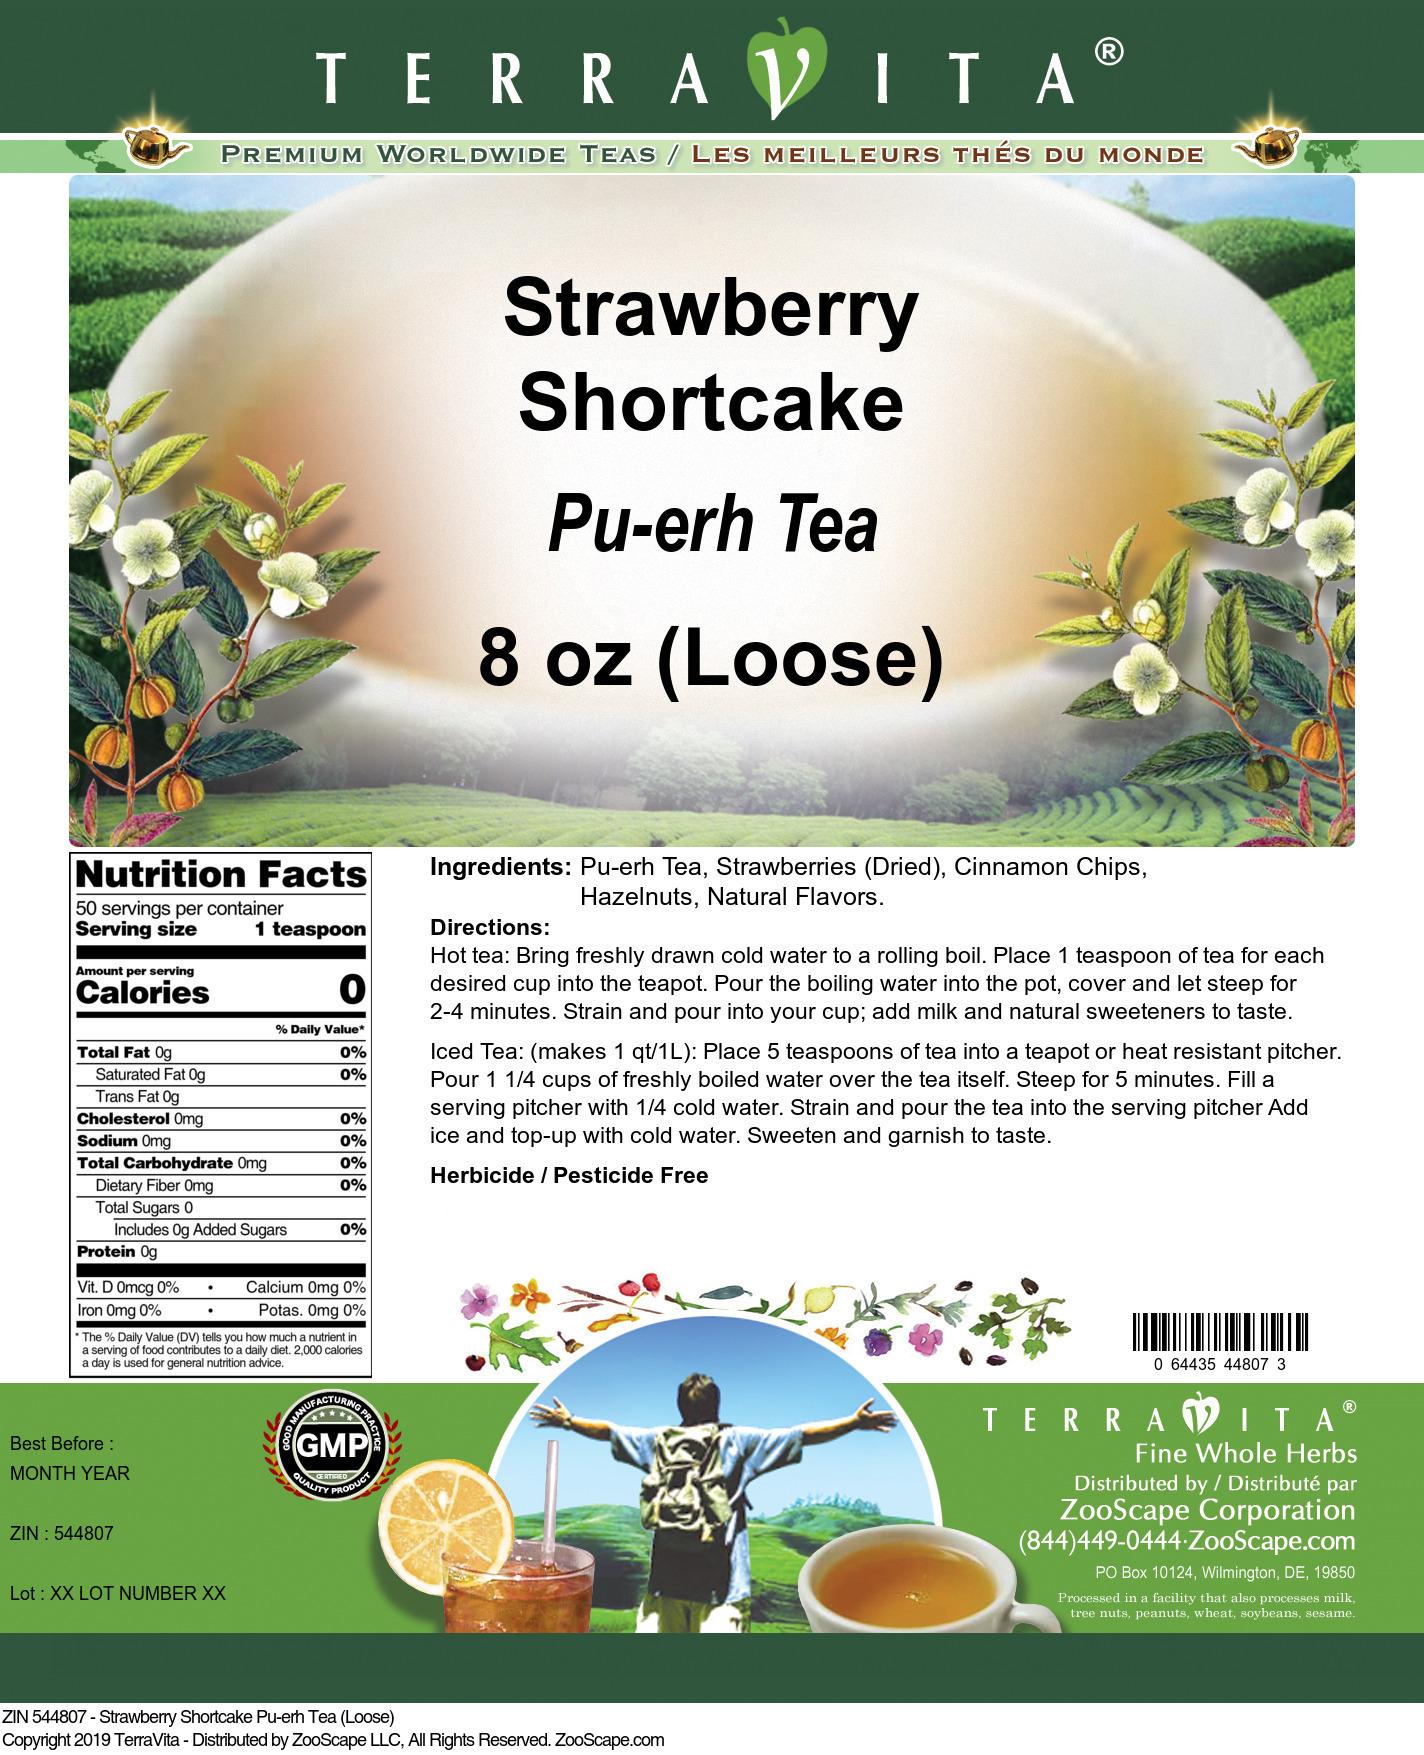 Strawberry Shortcake Pu-erh Tea (Loose)